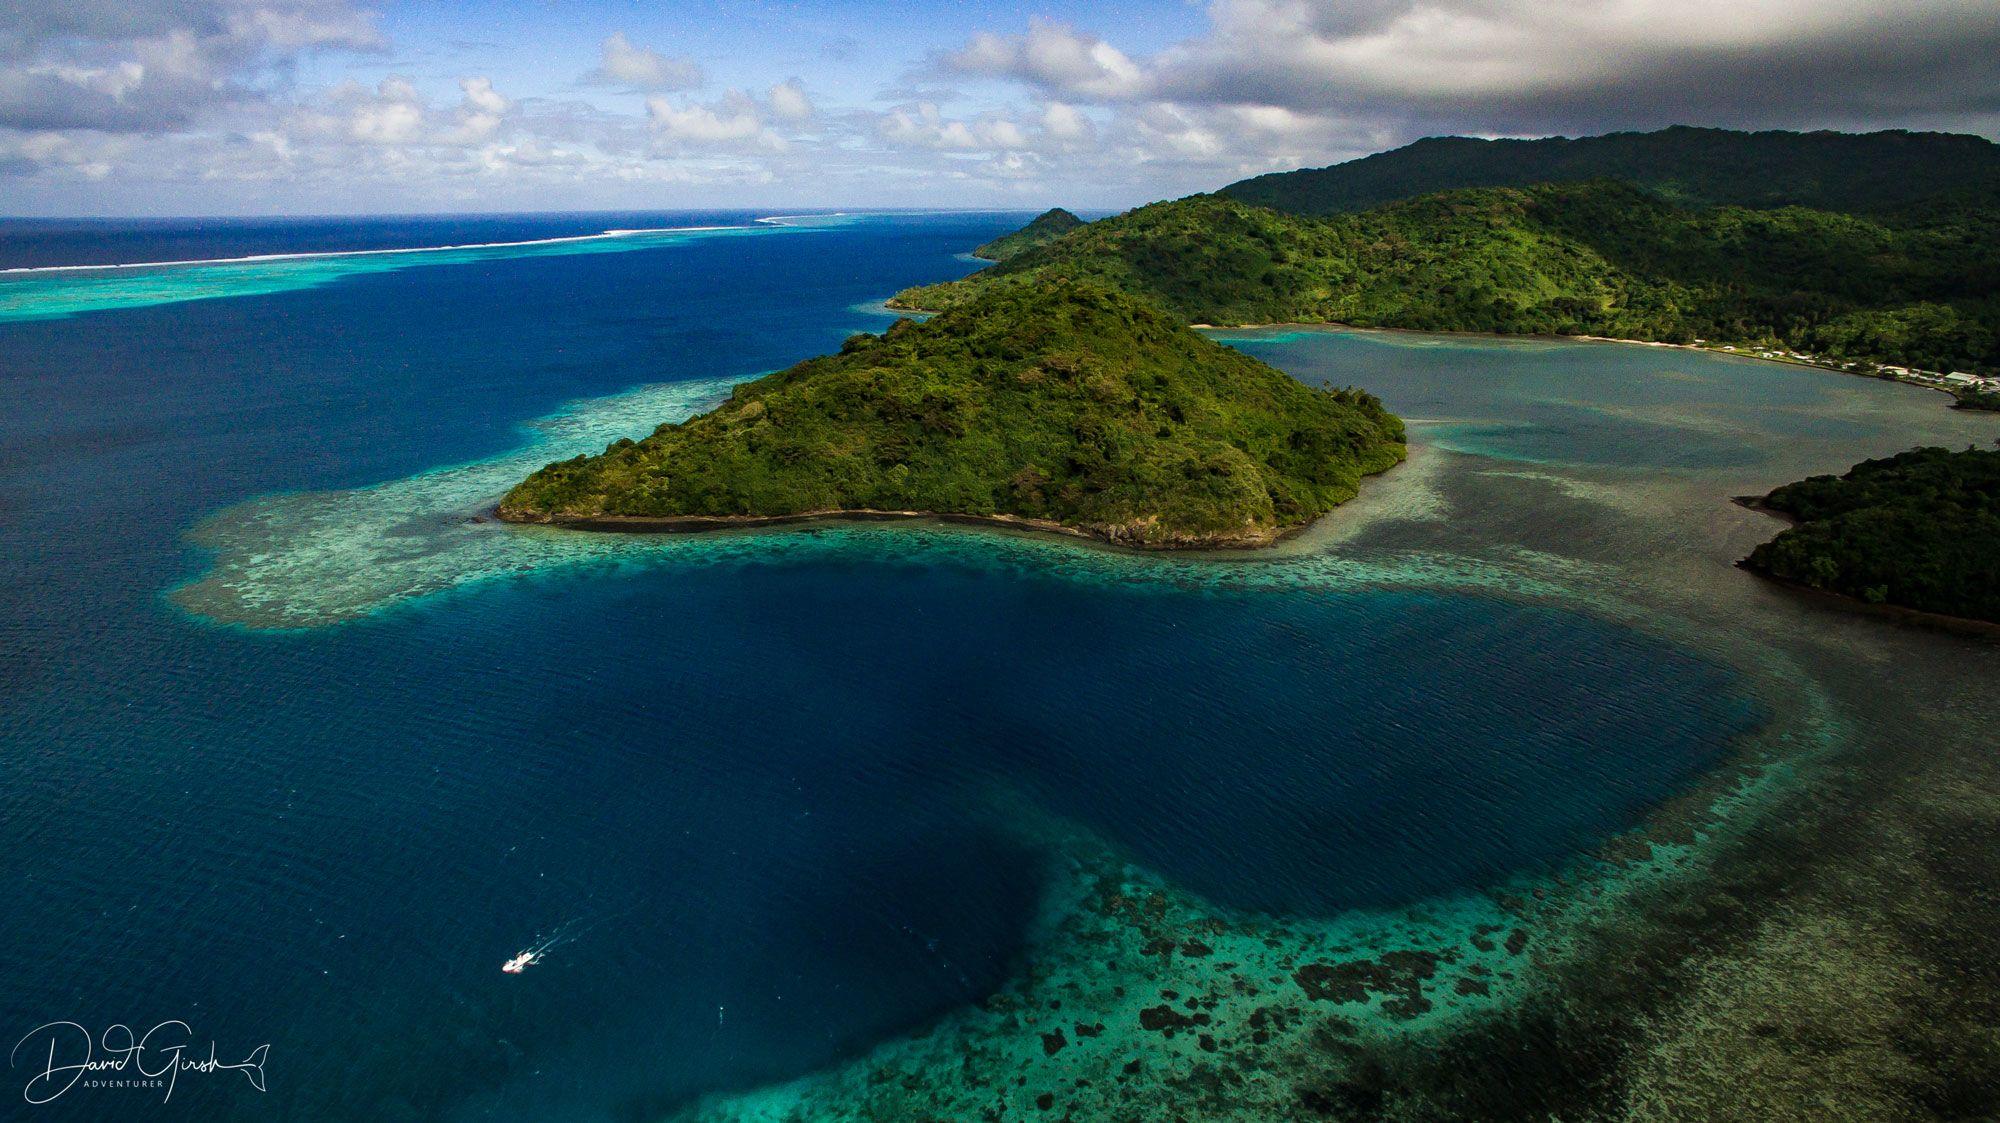 Conservation Spotlight: Pacific Blue Foundation's Beqa Lagoon Initiative